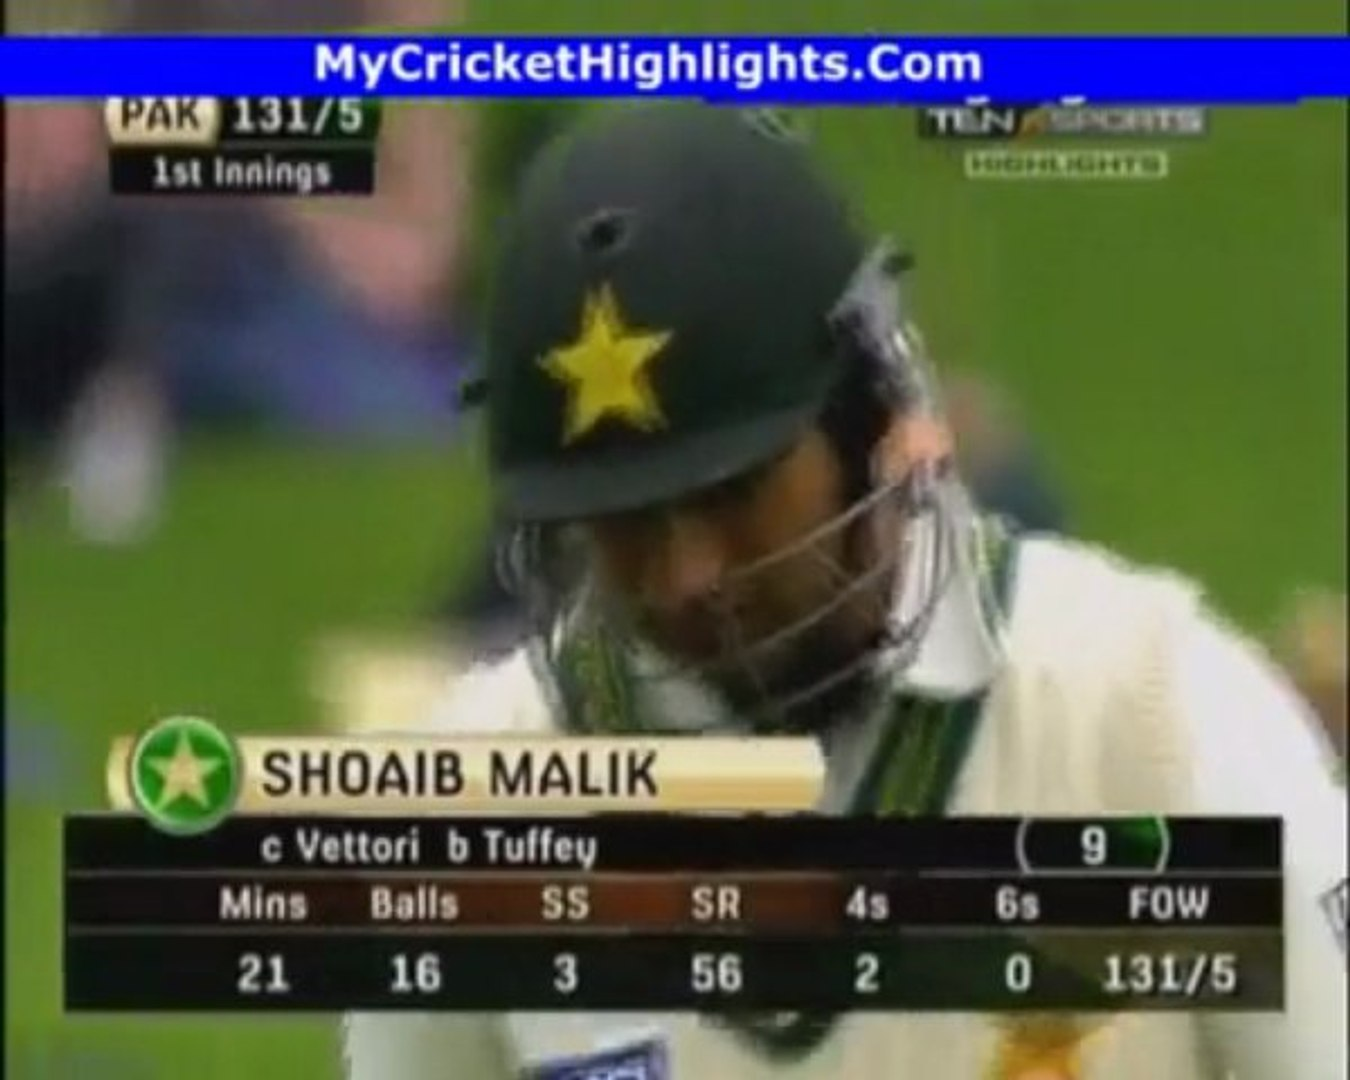 New Zealand Vs Pakistan 2nd Test Day 1 Highlights